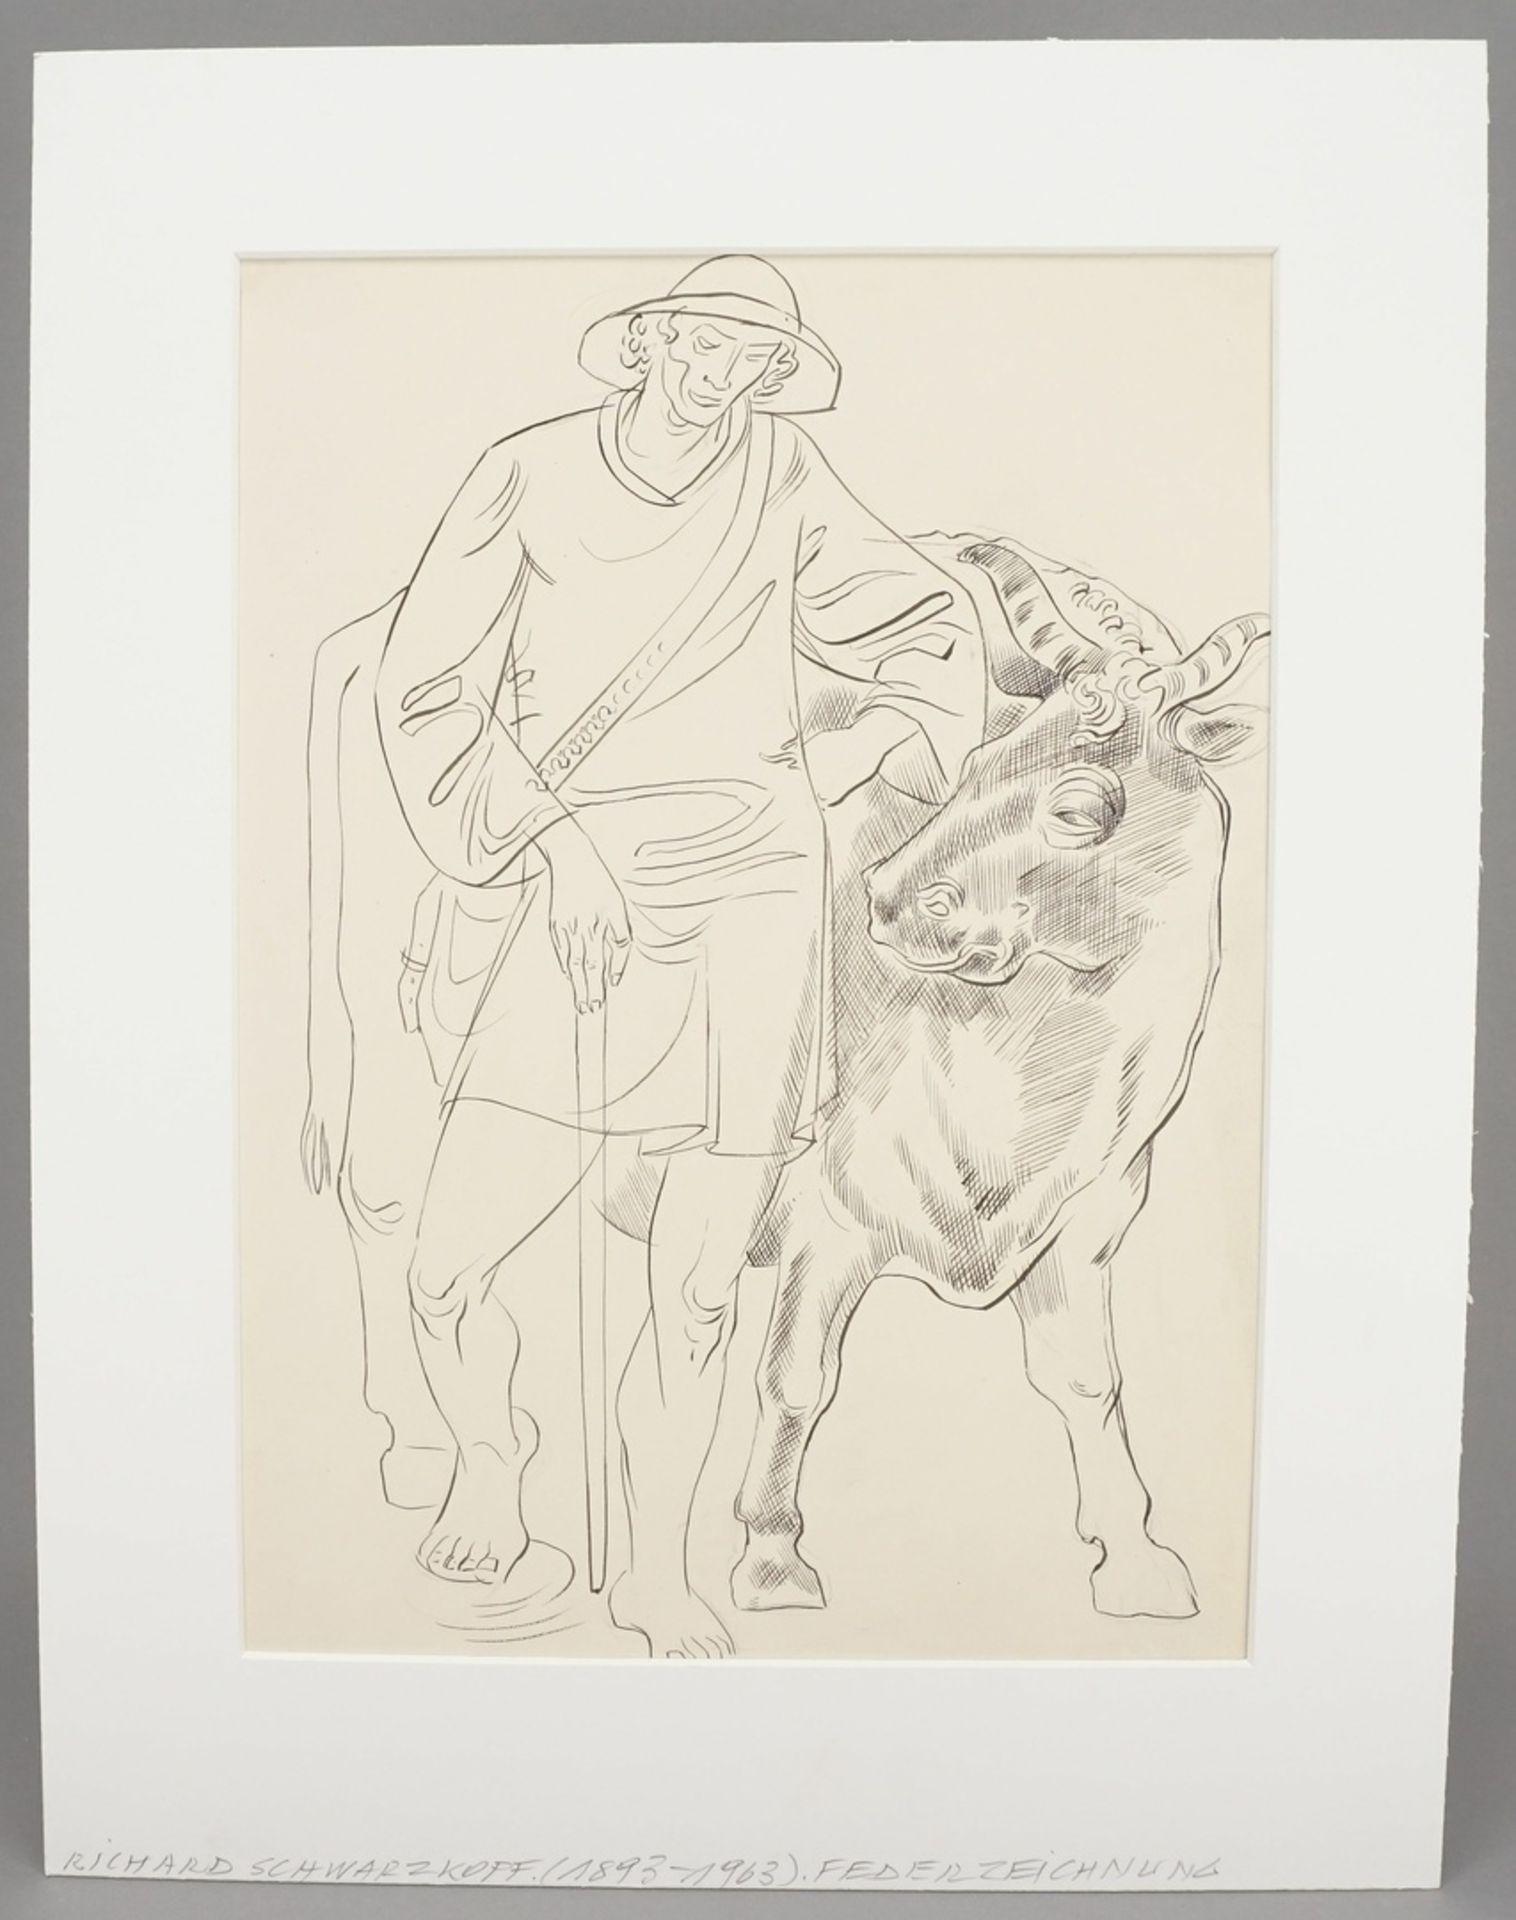 Richard Schwarzkopf, Kuh-Hirte - Bild 2 aus 4